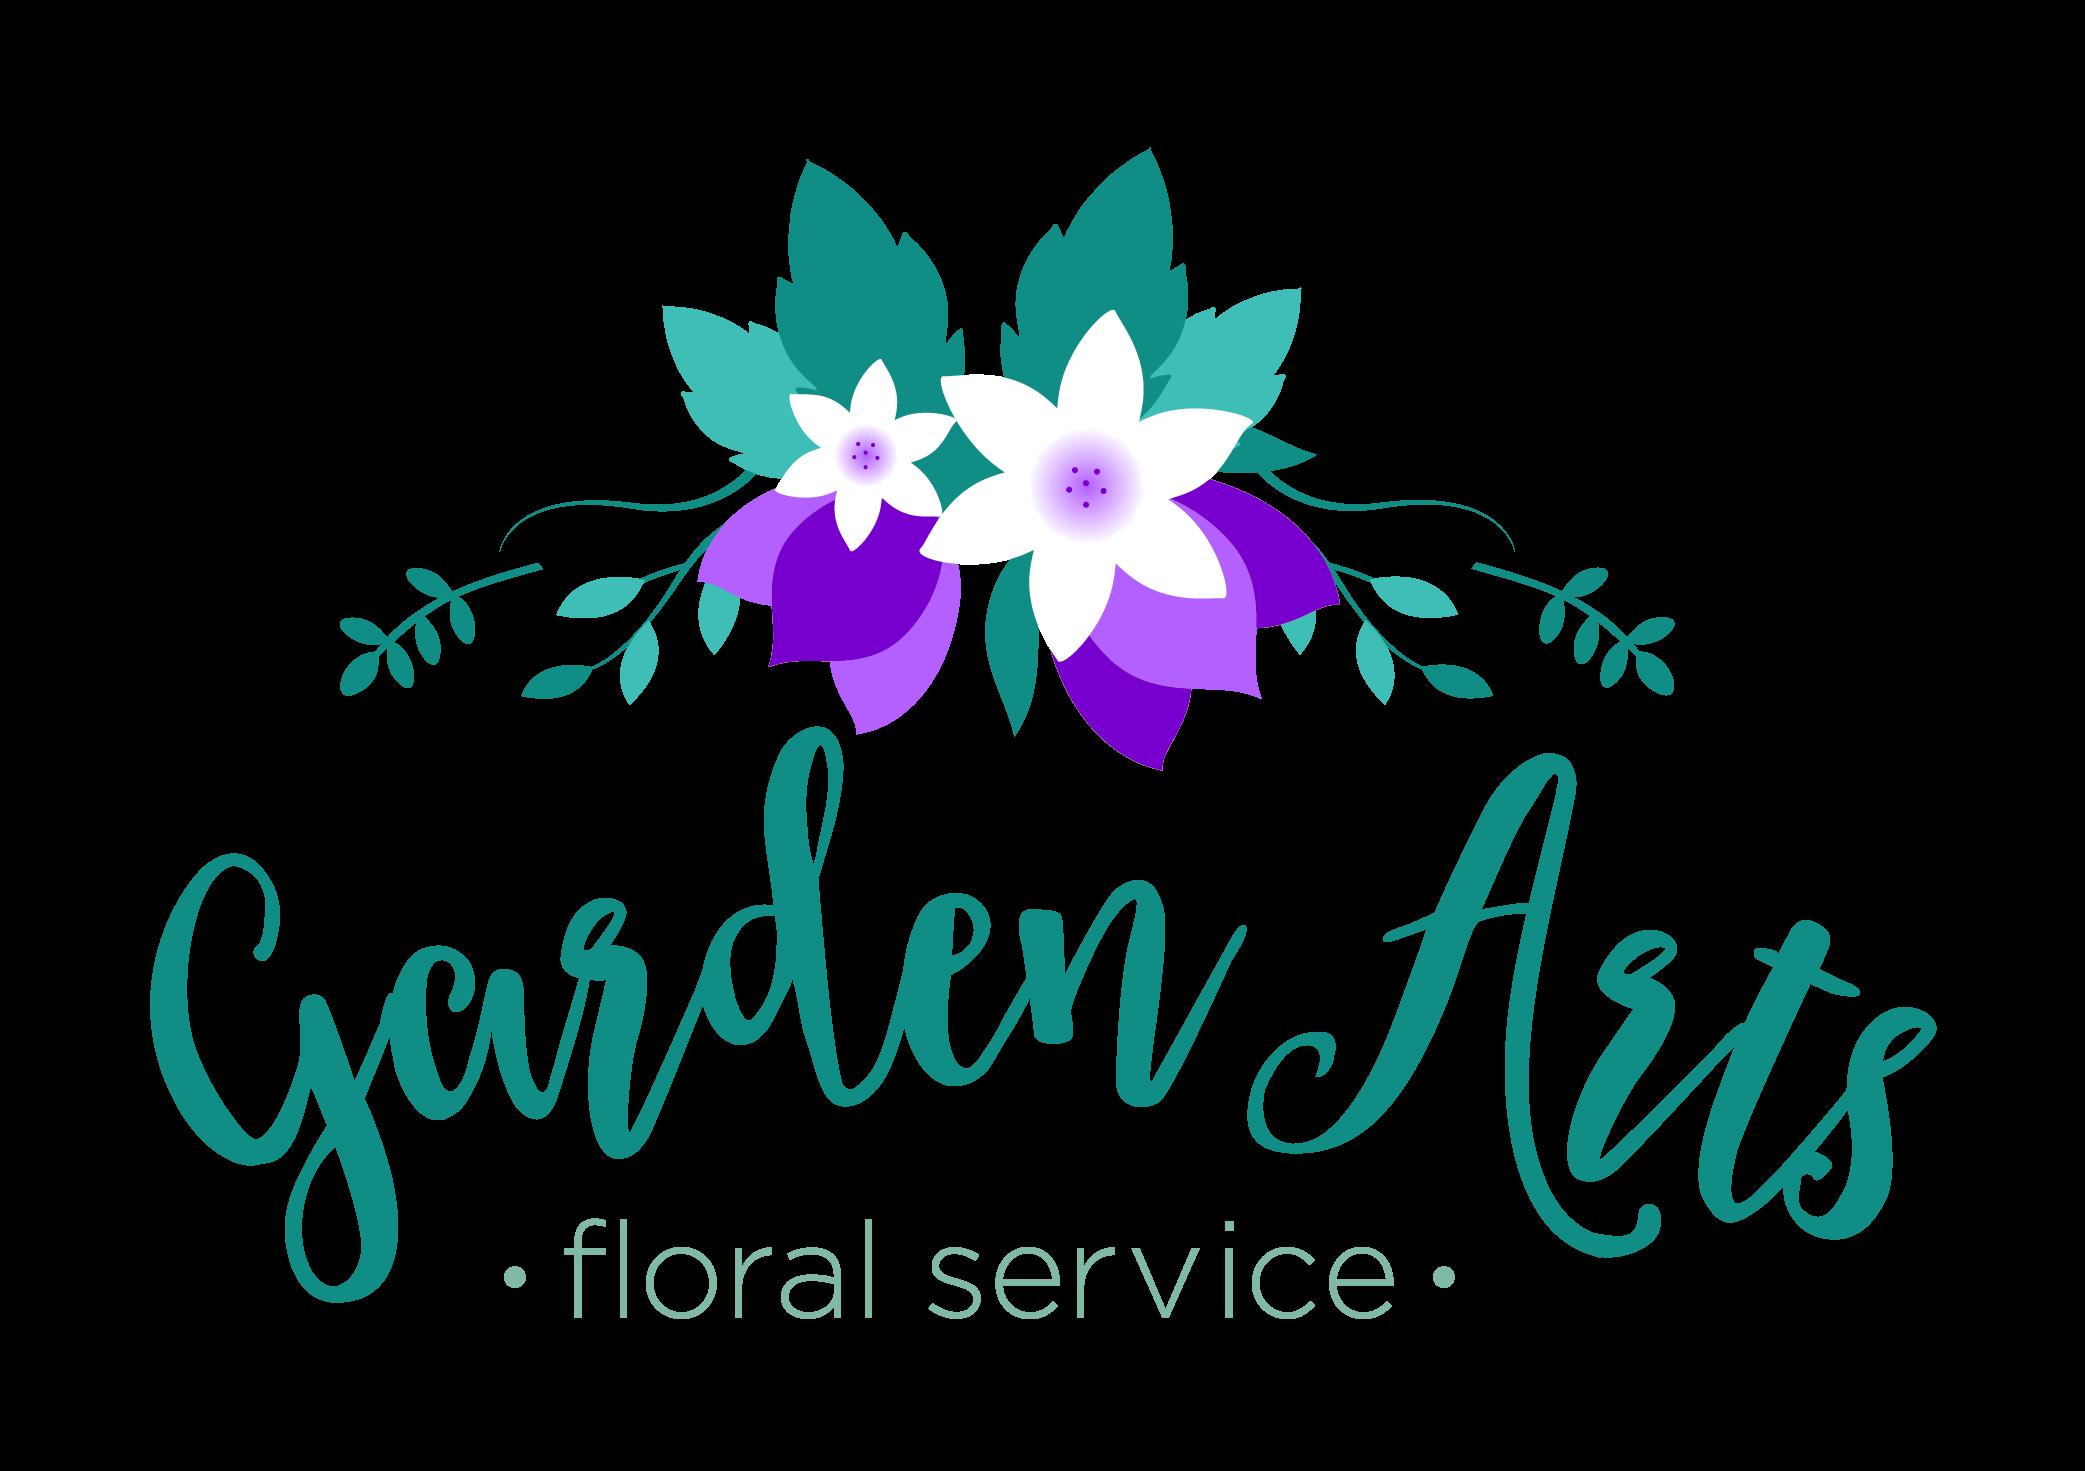 Garden Arts by Shirley